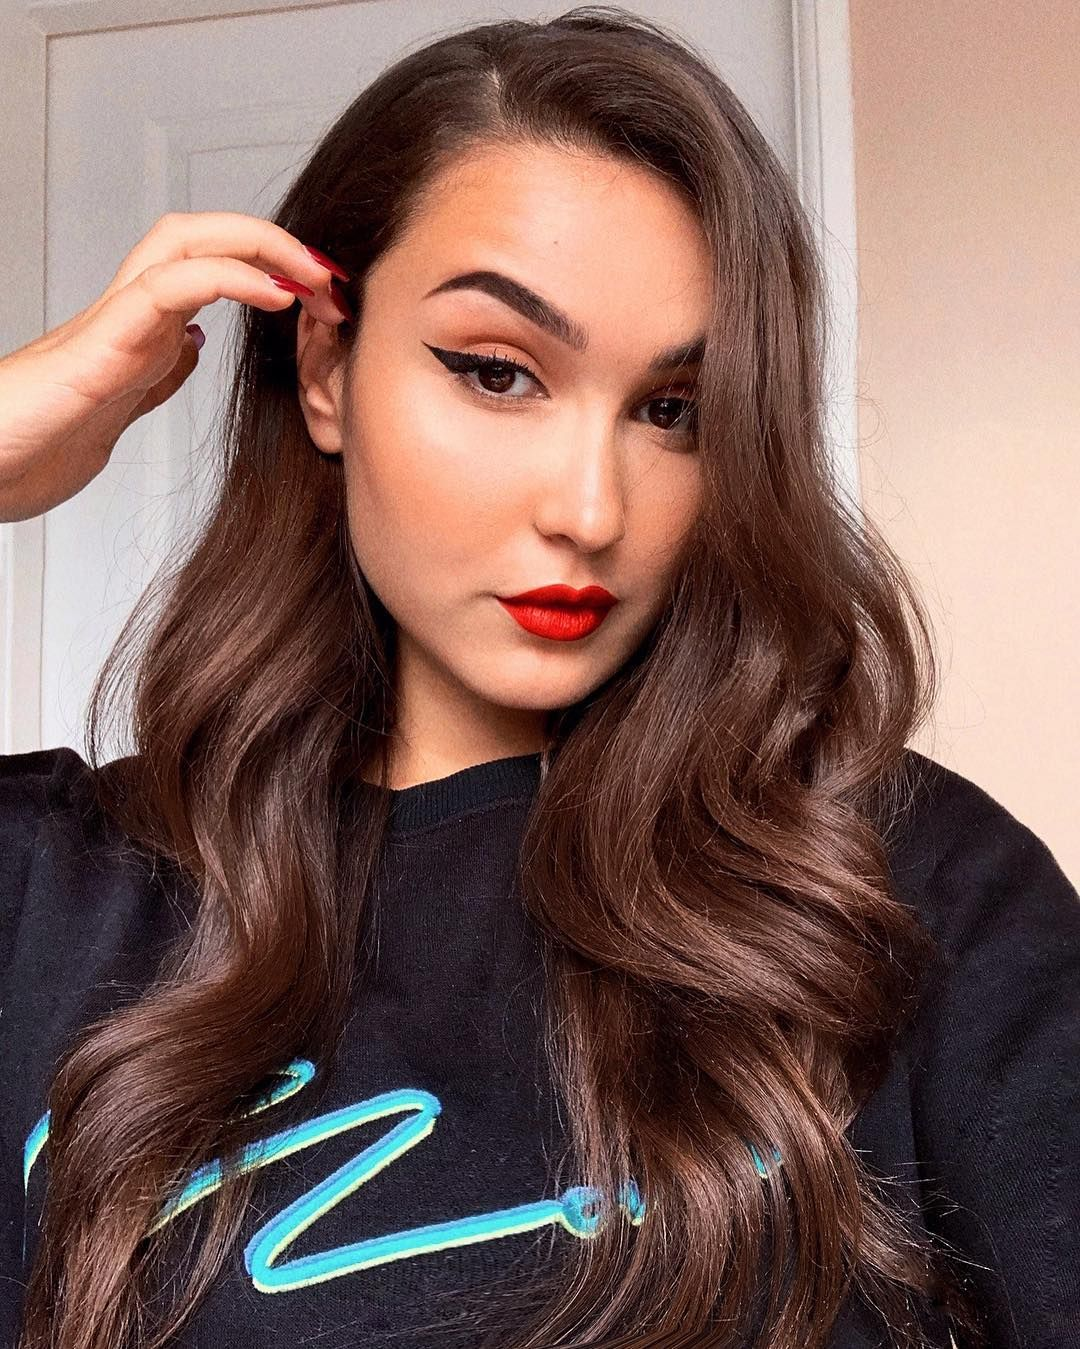 Maroua Thedollbeauty Photos Et Videos Instagram Beauty Beauty Makeup Hair Styles